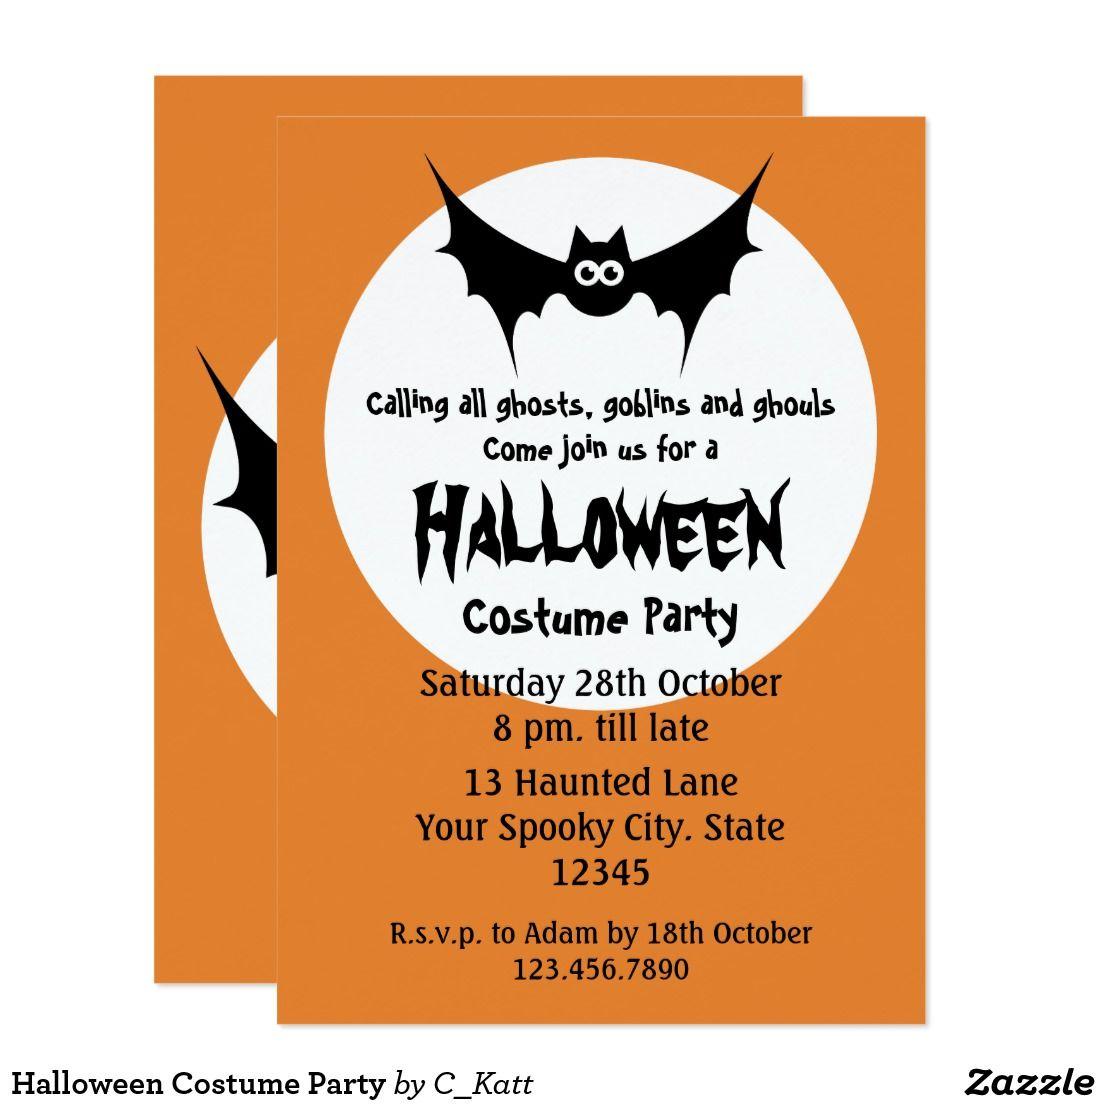 Halloween Costume Party Card Invitations Orange Halloween costume ...